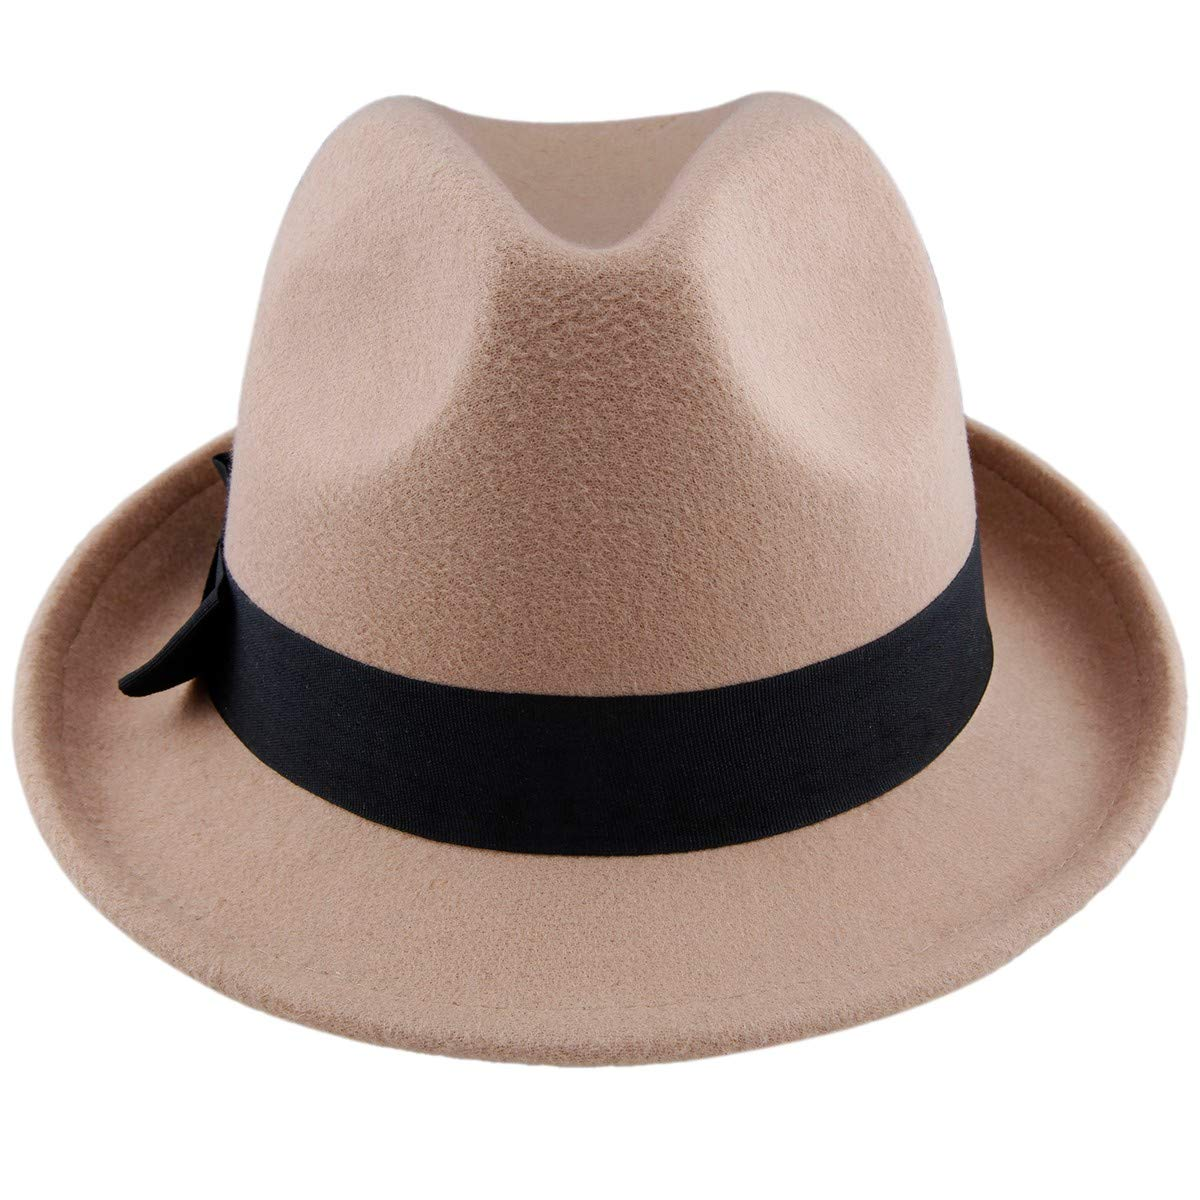 Samtree Fedora Hats for Women,Winter Roll-up Brim Trilby Woolen Jazz Cap(Tan)